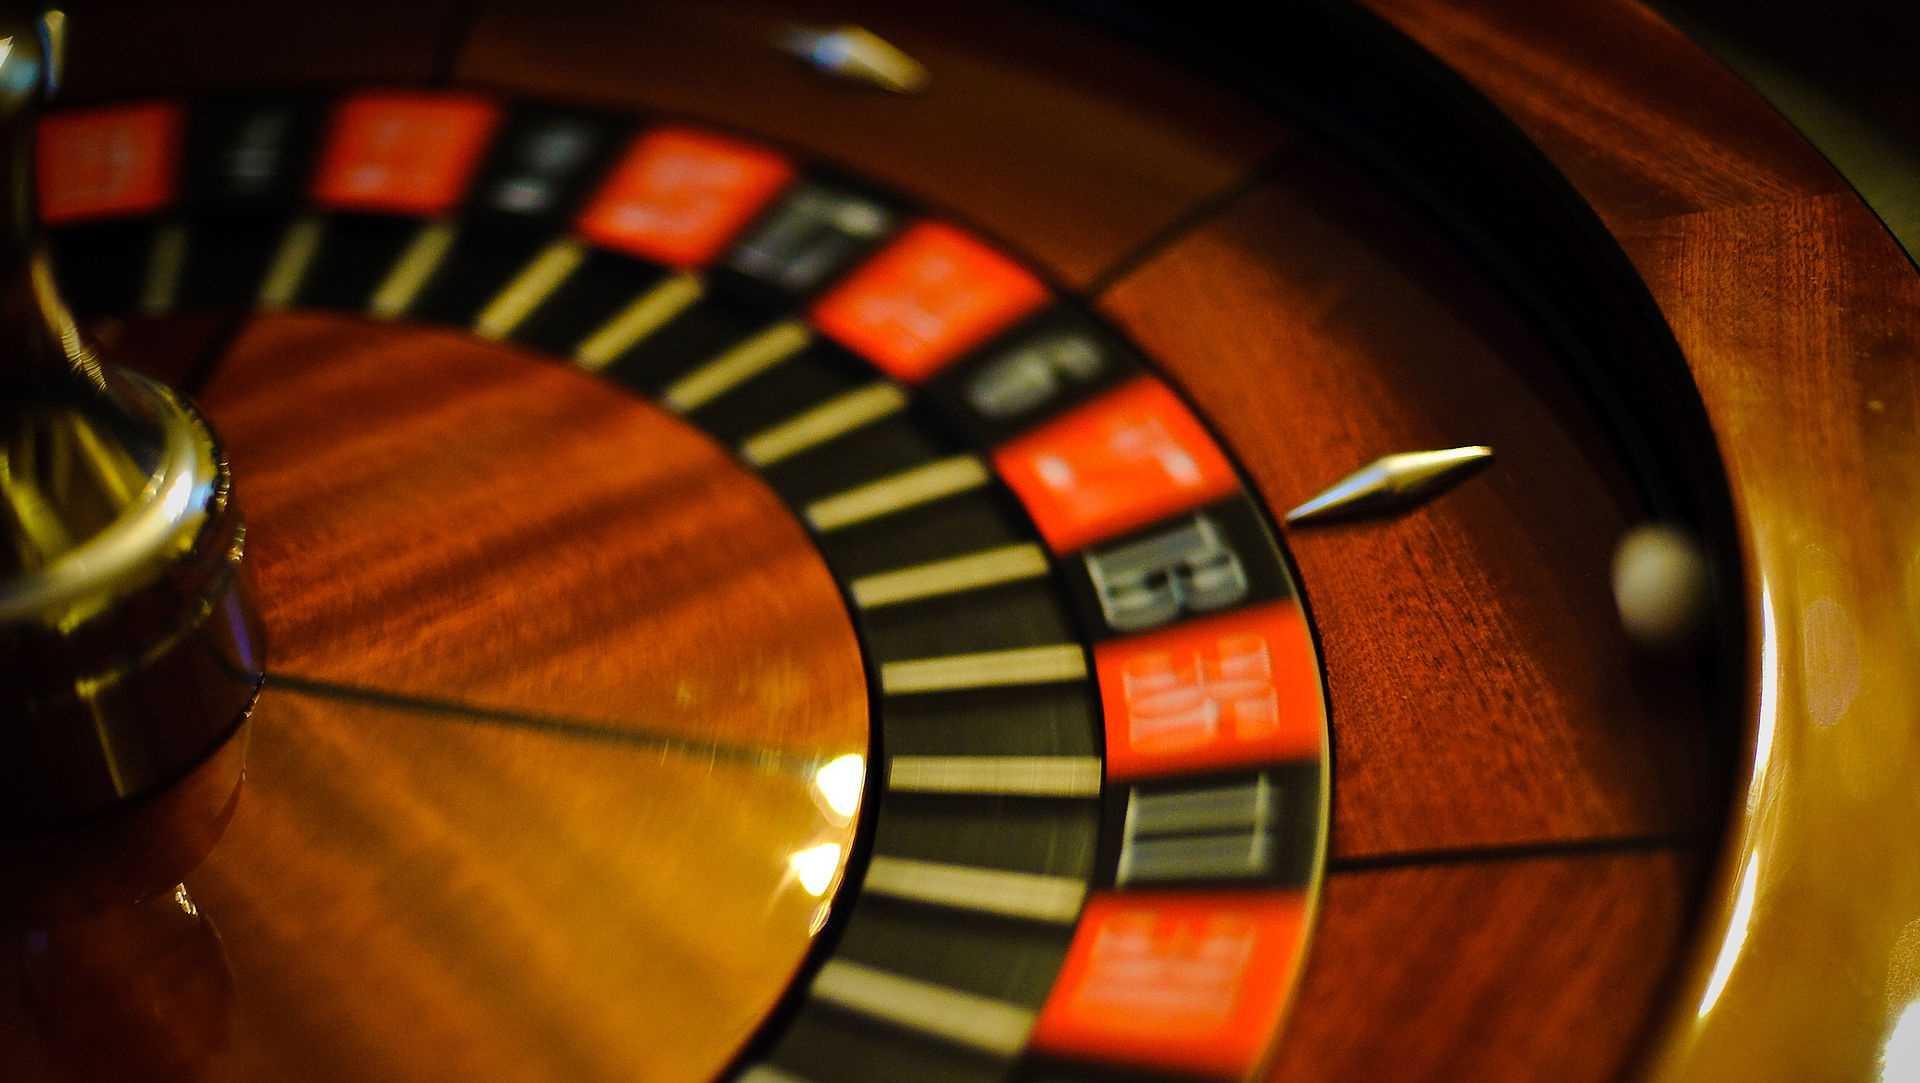 14 gambling.jpg